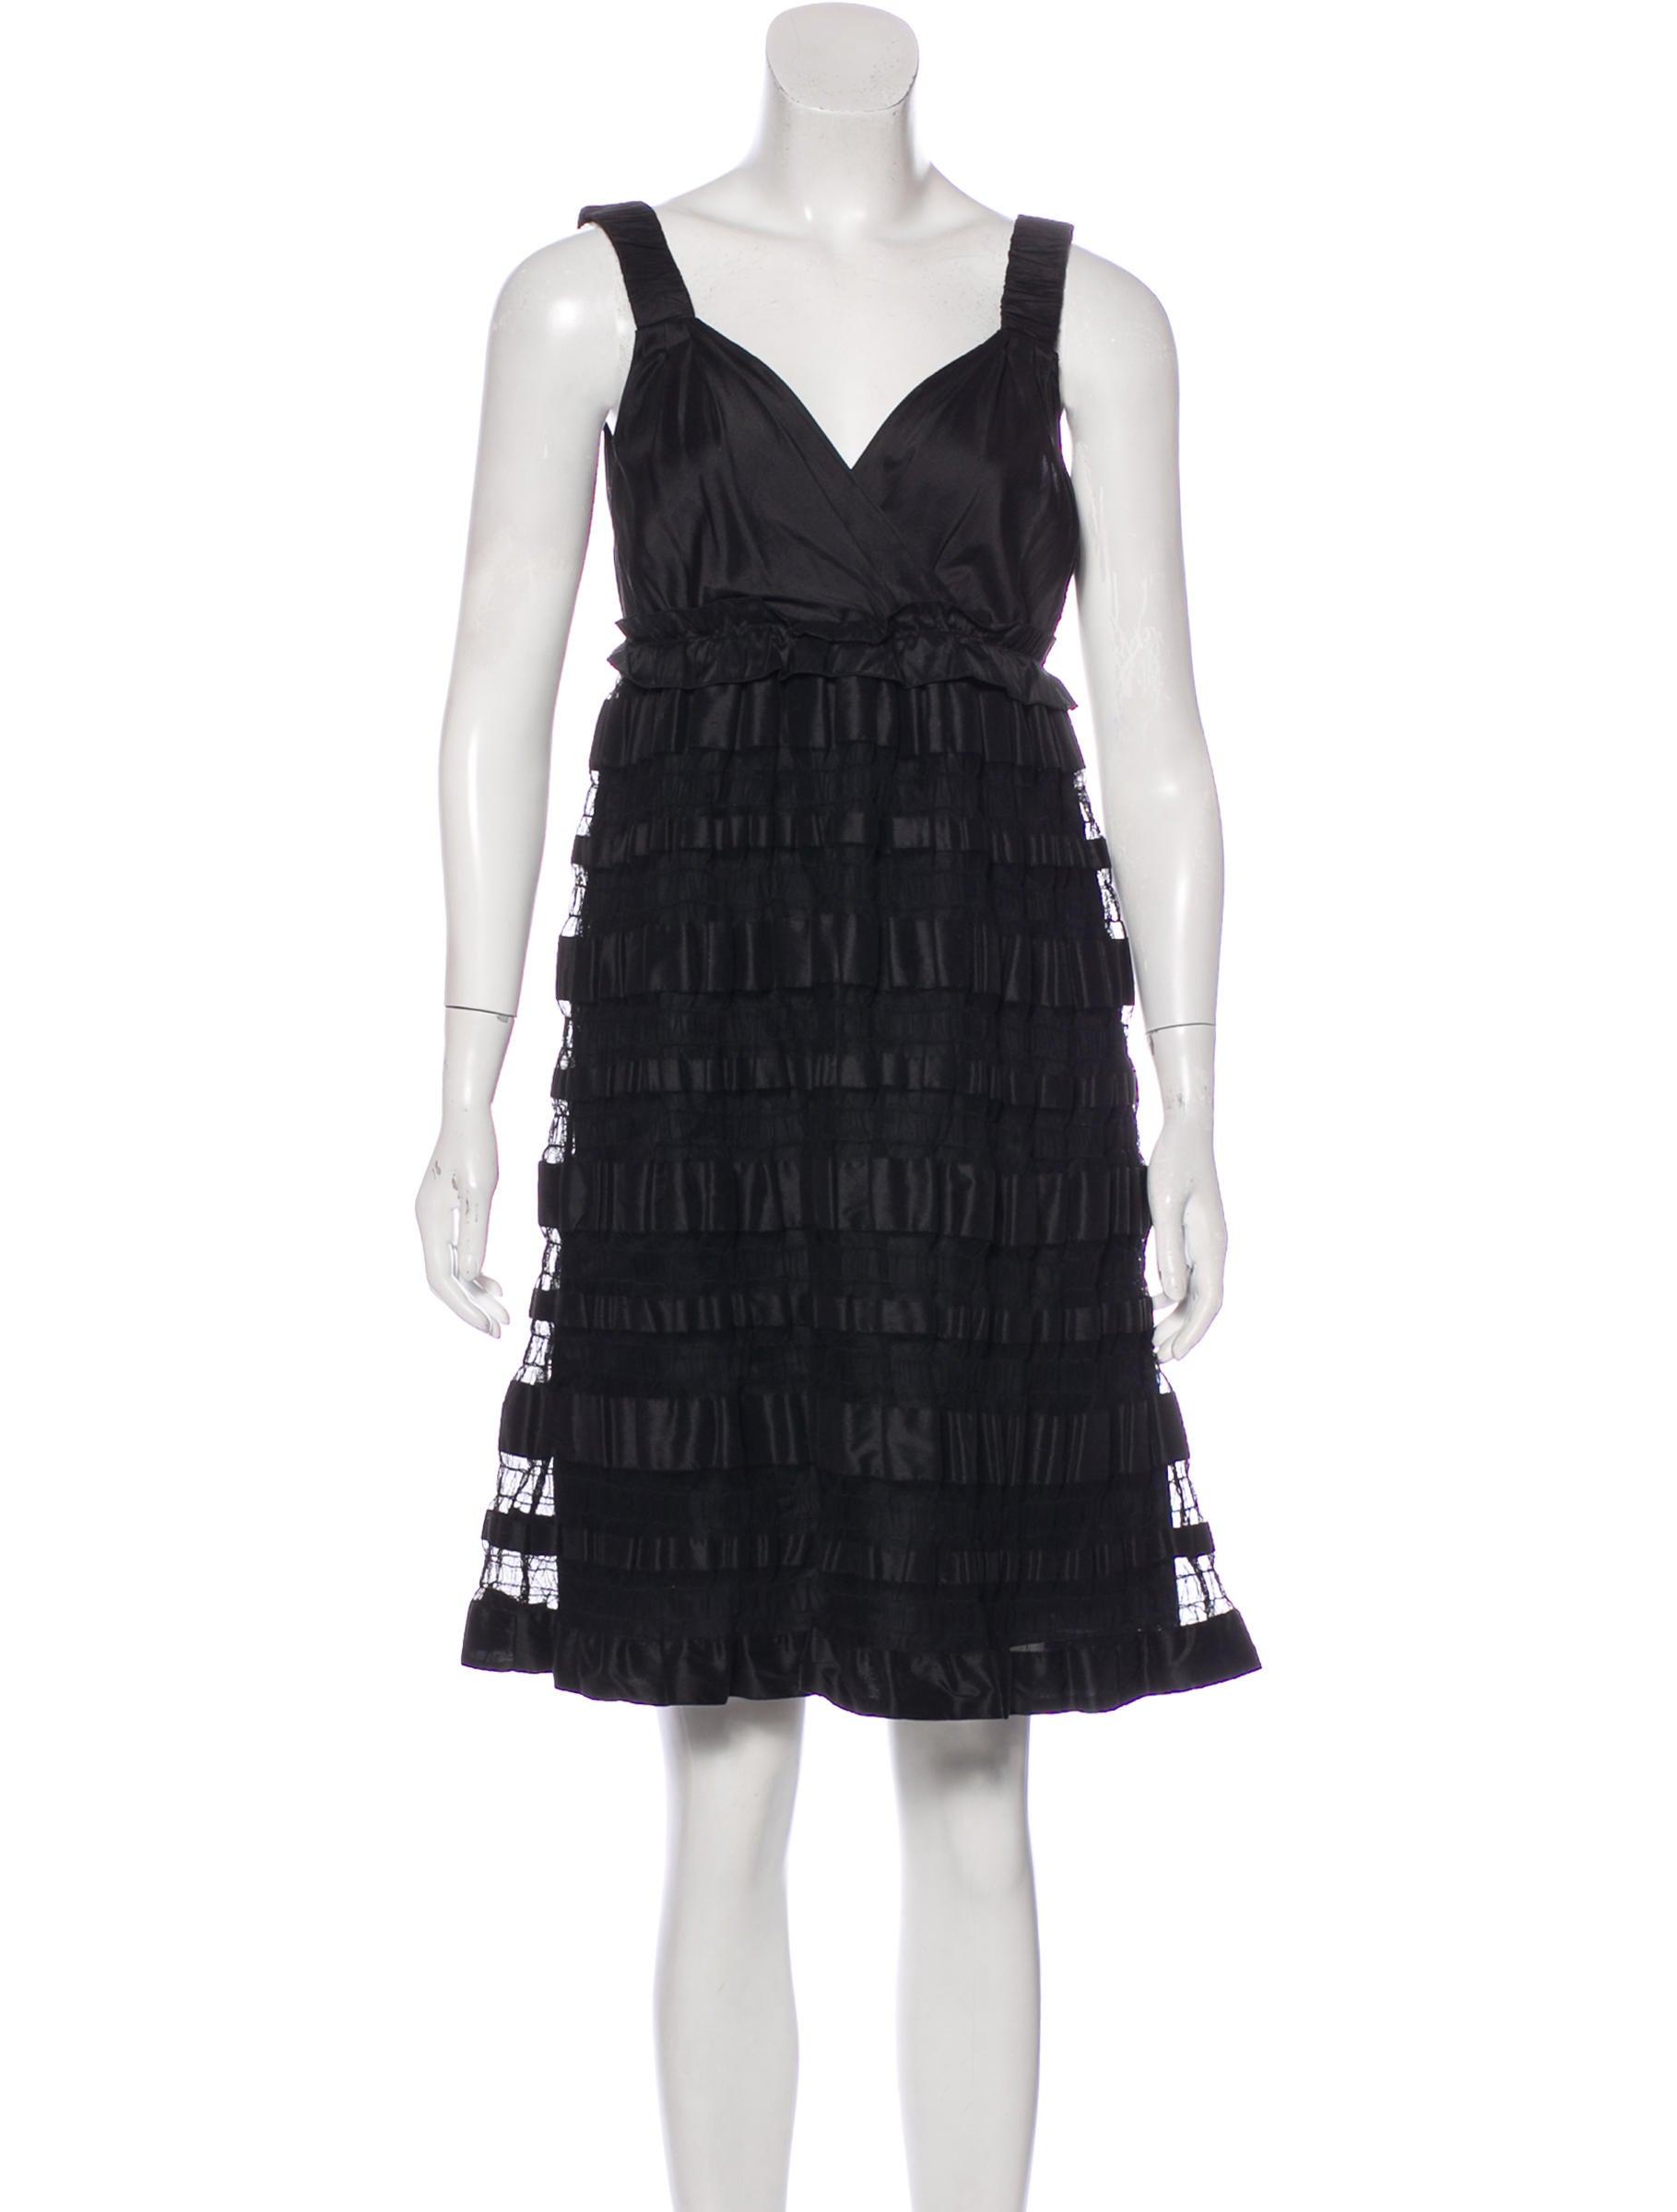 21bd26fc6b5 Cheap Casual Knee Length Dresses - Data Dynamic AG